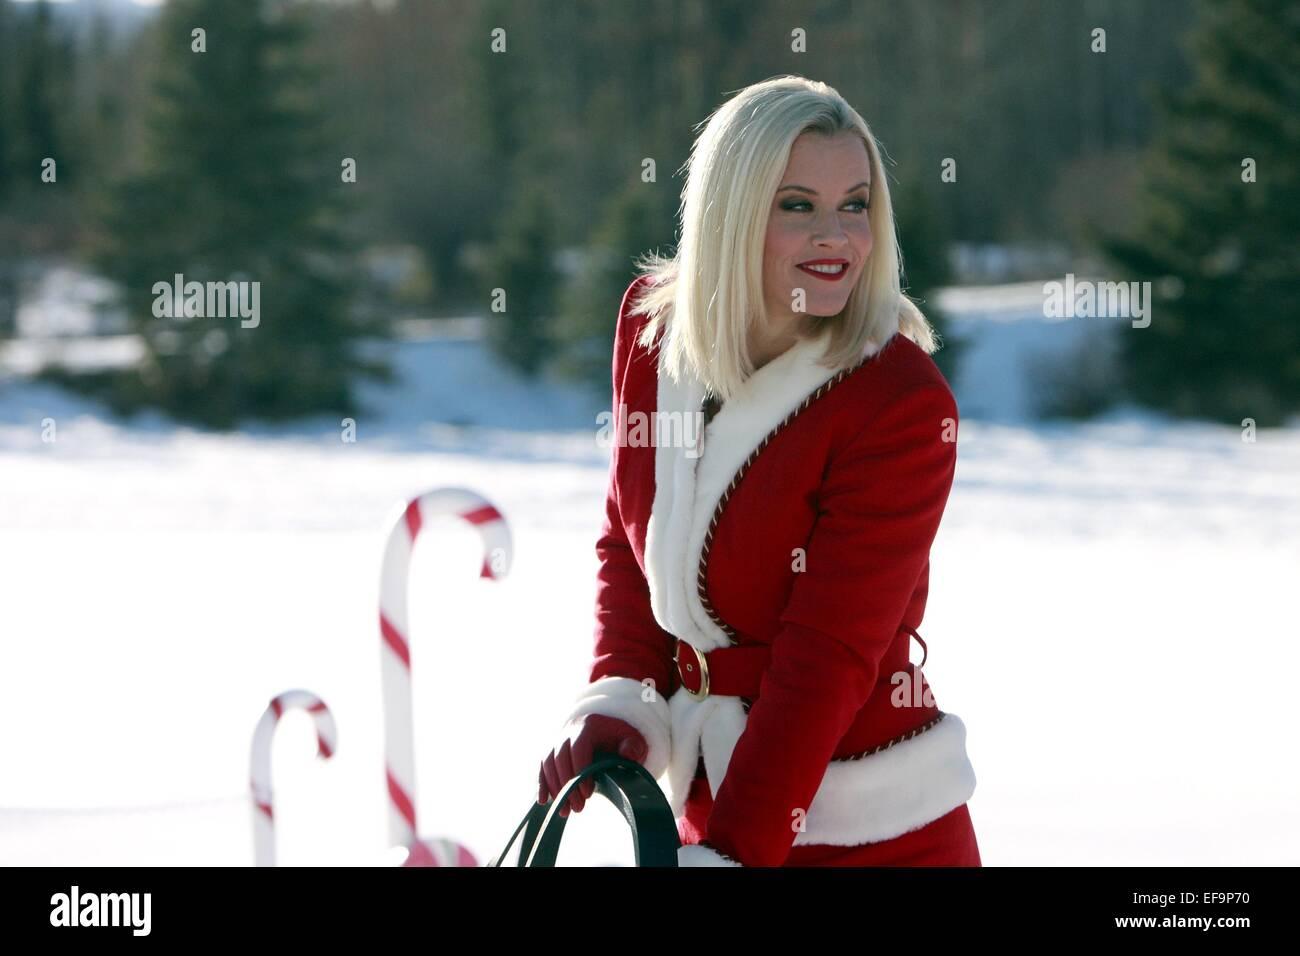 jenny mccarthy santa baby 2 christmas maybe 2009 stock image - Santa Baby 2 Christmas Maybe